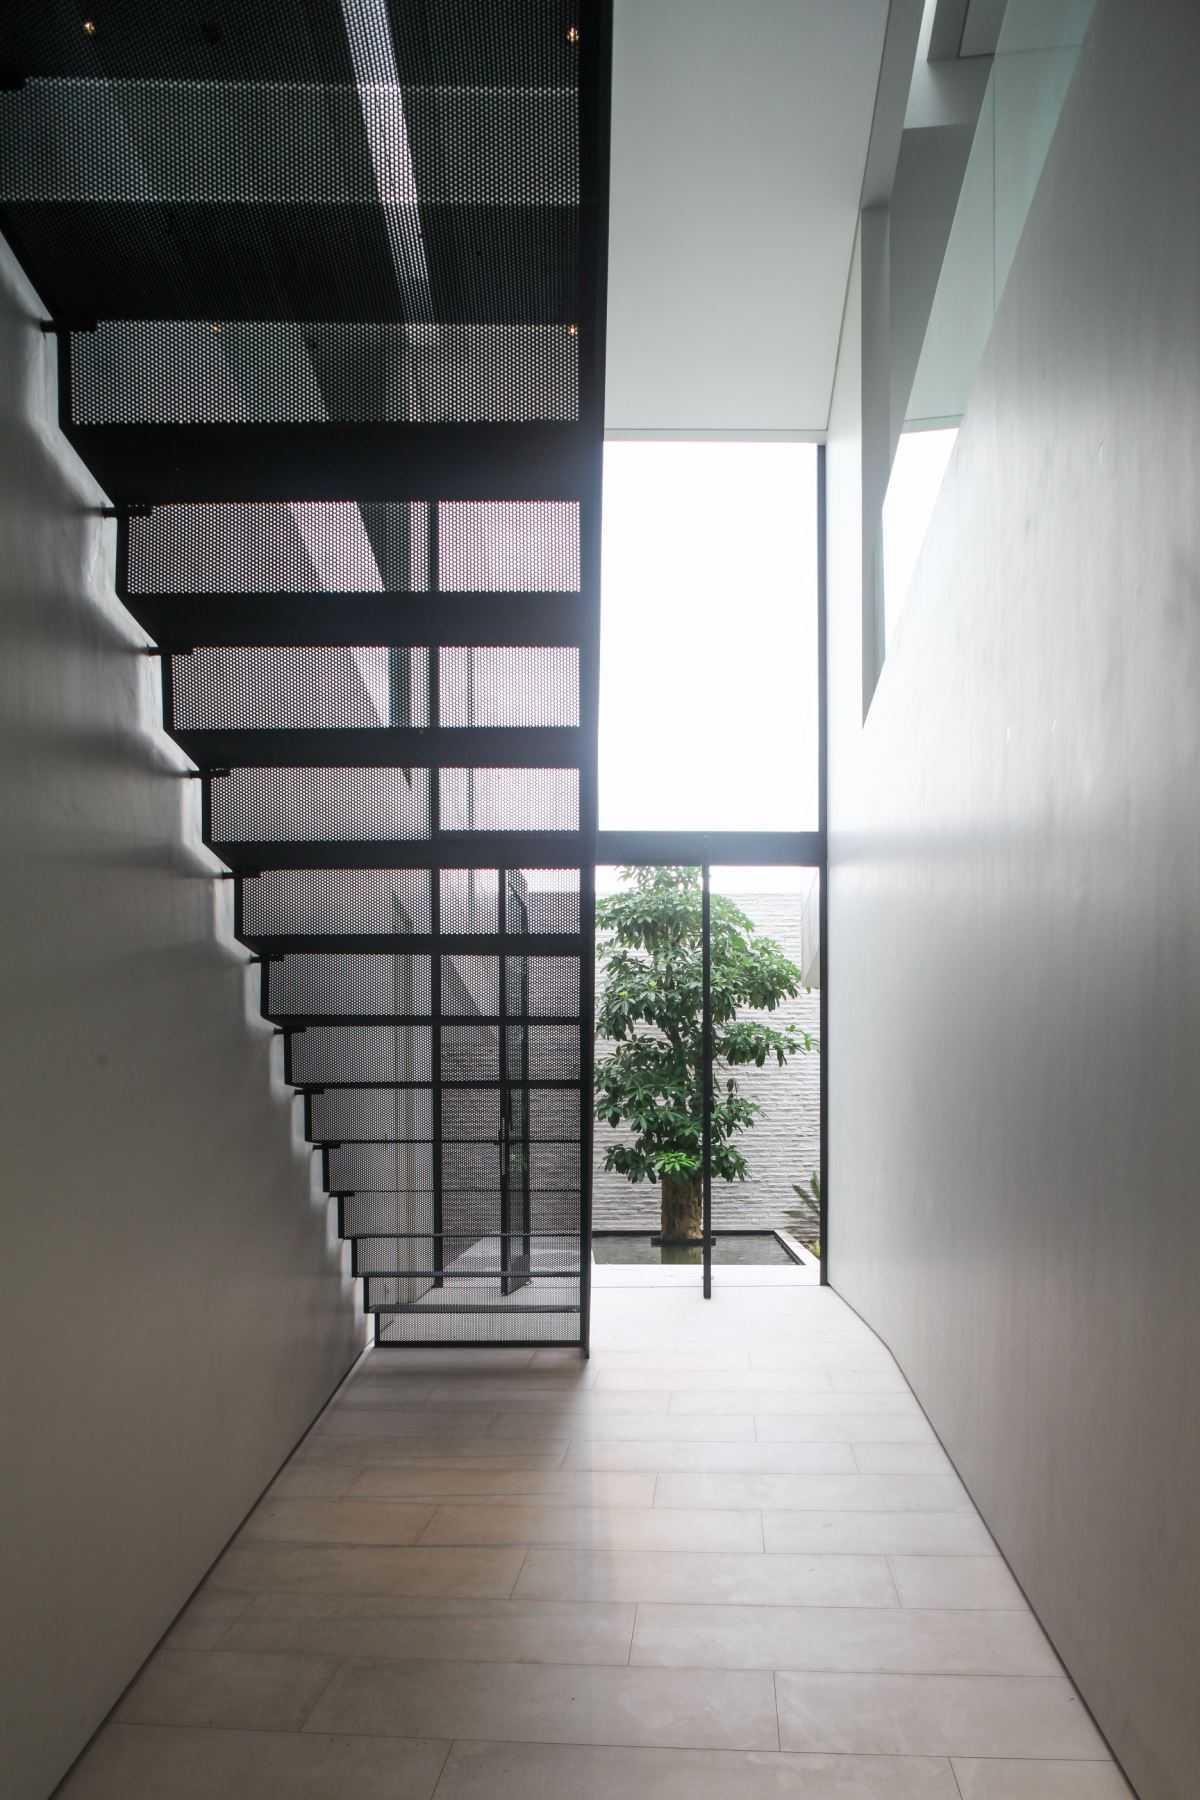 Ivan Priatman Architecture Rl House Surabaya, Kota Sby, Jawa Timur, Indonesia Surabaya, Kota Sby, Jawa Timur, Indonesia Ivan-Priatman-Architecture-Rl-House   59094